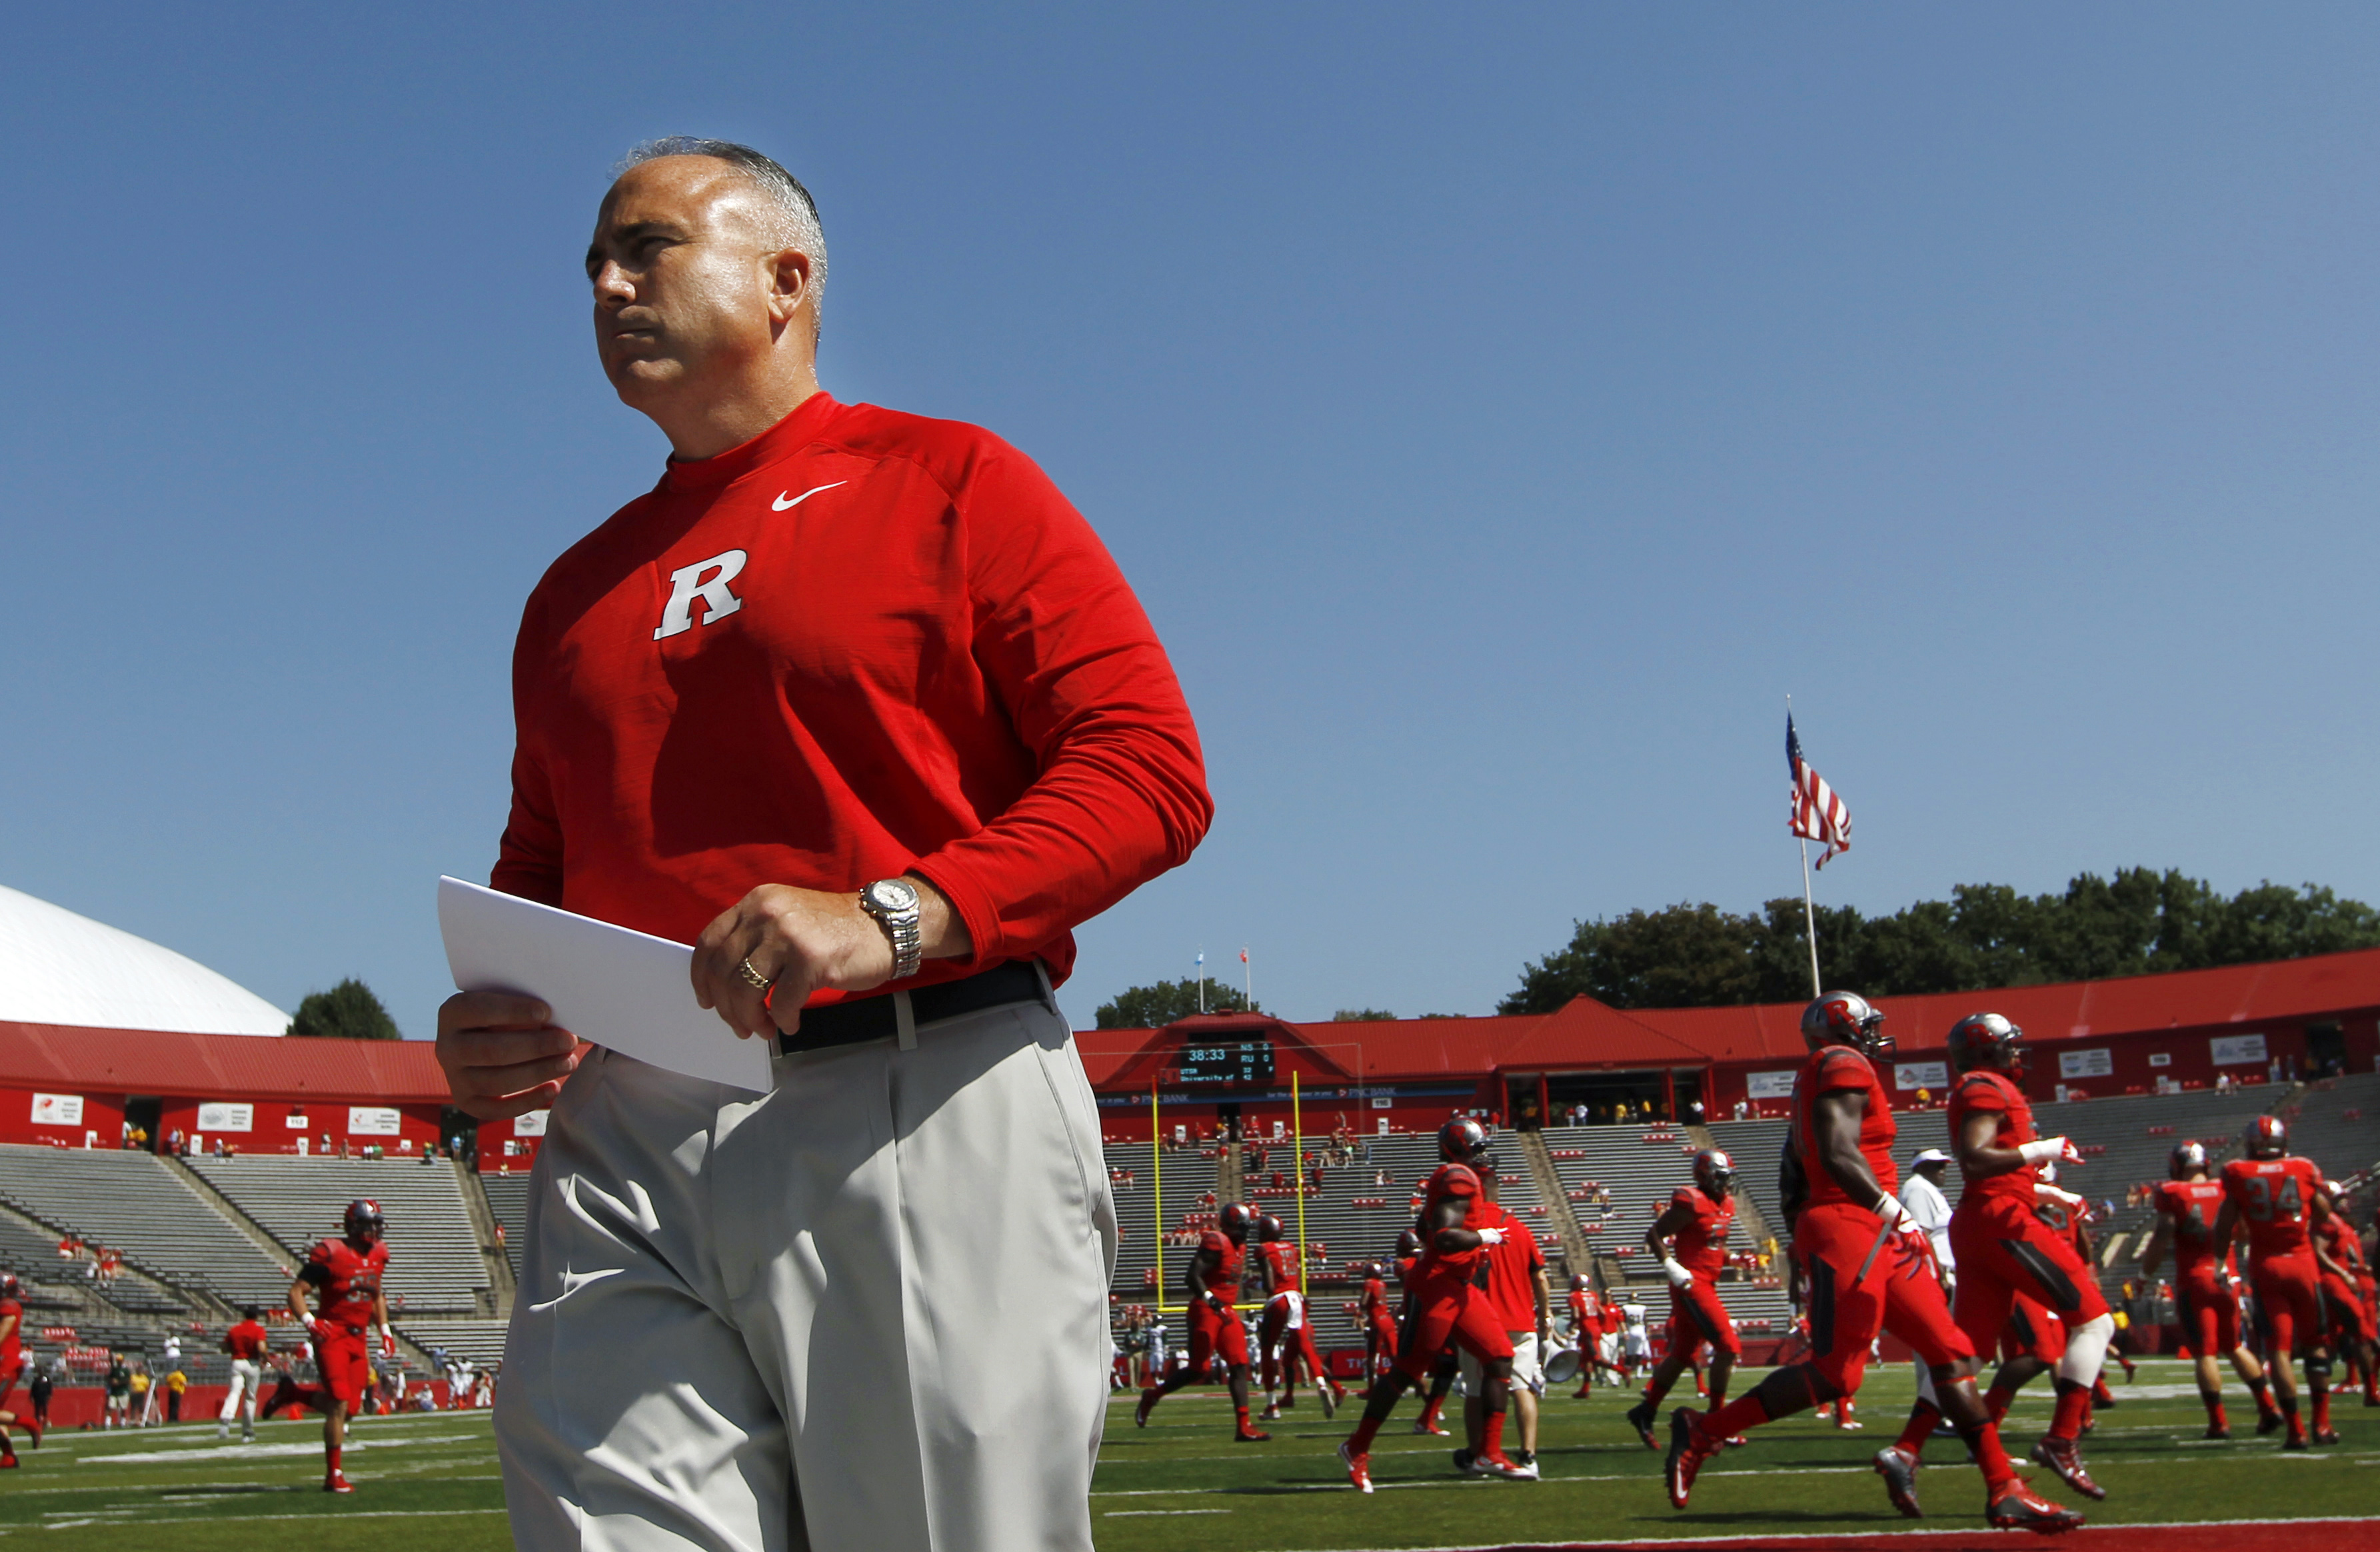 Rutgers head coach Kyle Flood walks on the field before an NCAA college football game against Norfolk State Saturday, Sept. 5, 2015, in Piscataway, N.J. (AP Photo/Mel Evans)